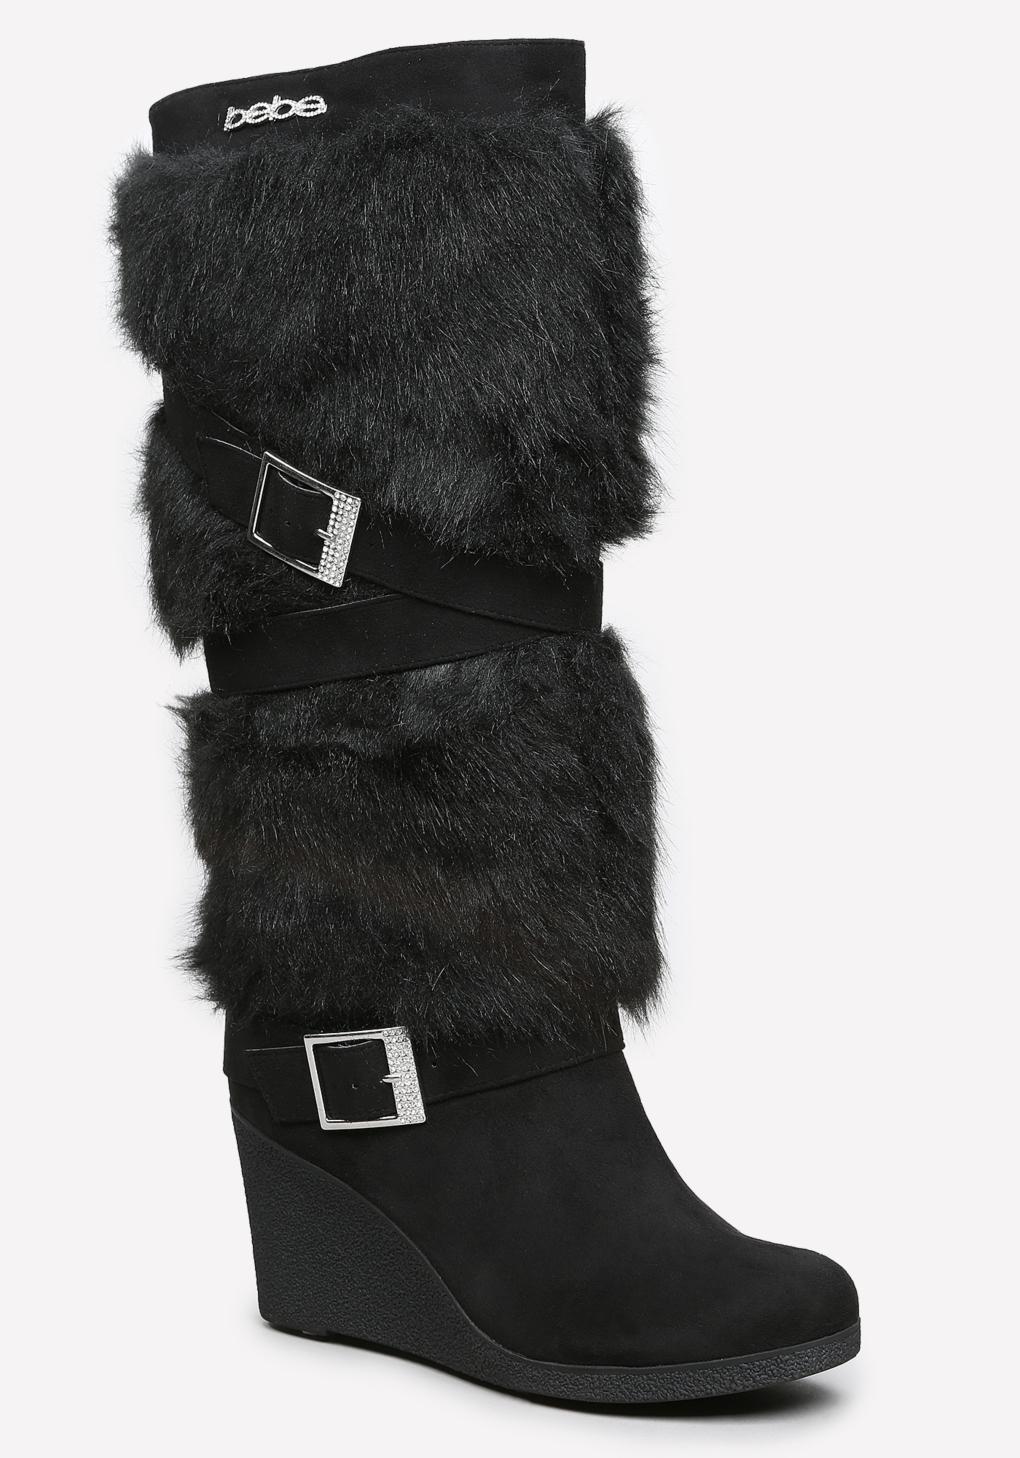 Lyst Bebe Geenna Faux Fur Boots In Black